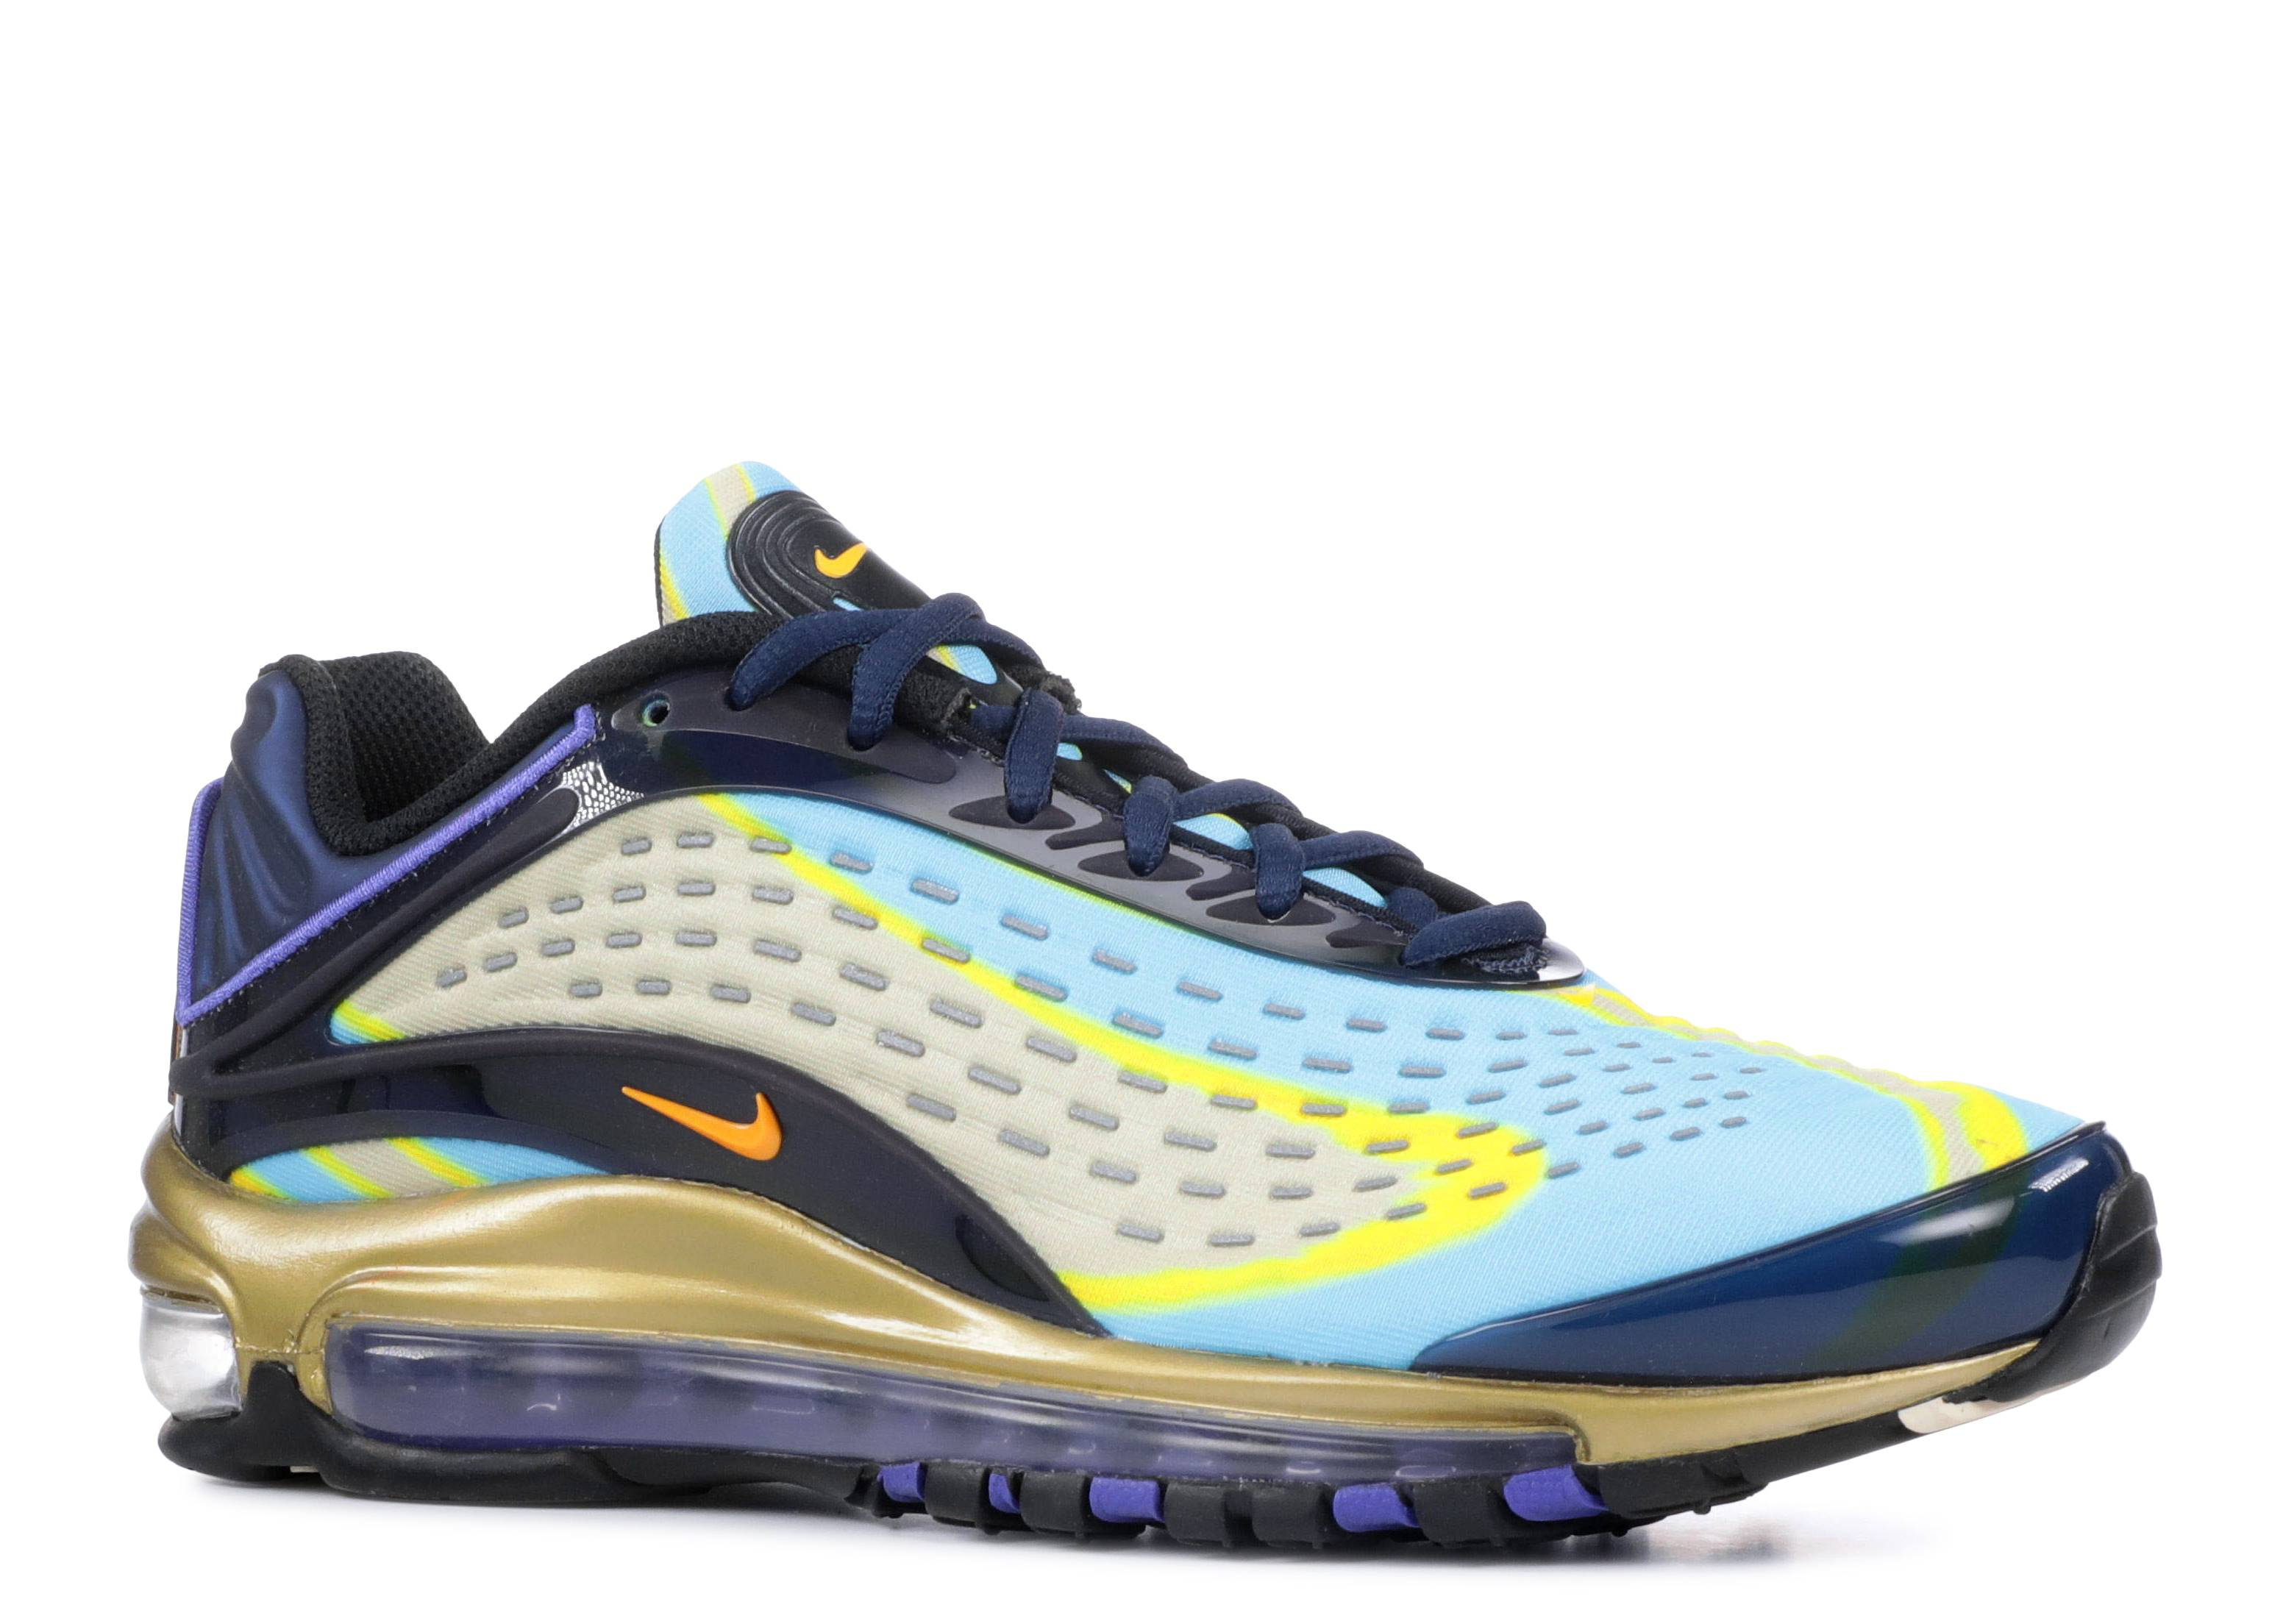 239b3c959c Nike Air Max Deluxe (gs) - Nike - ar0115 401 - midnight navy/ laser orange    Flight Club